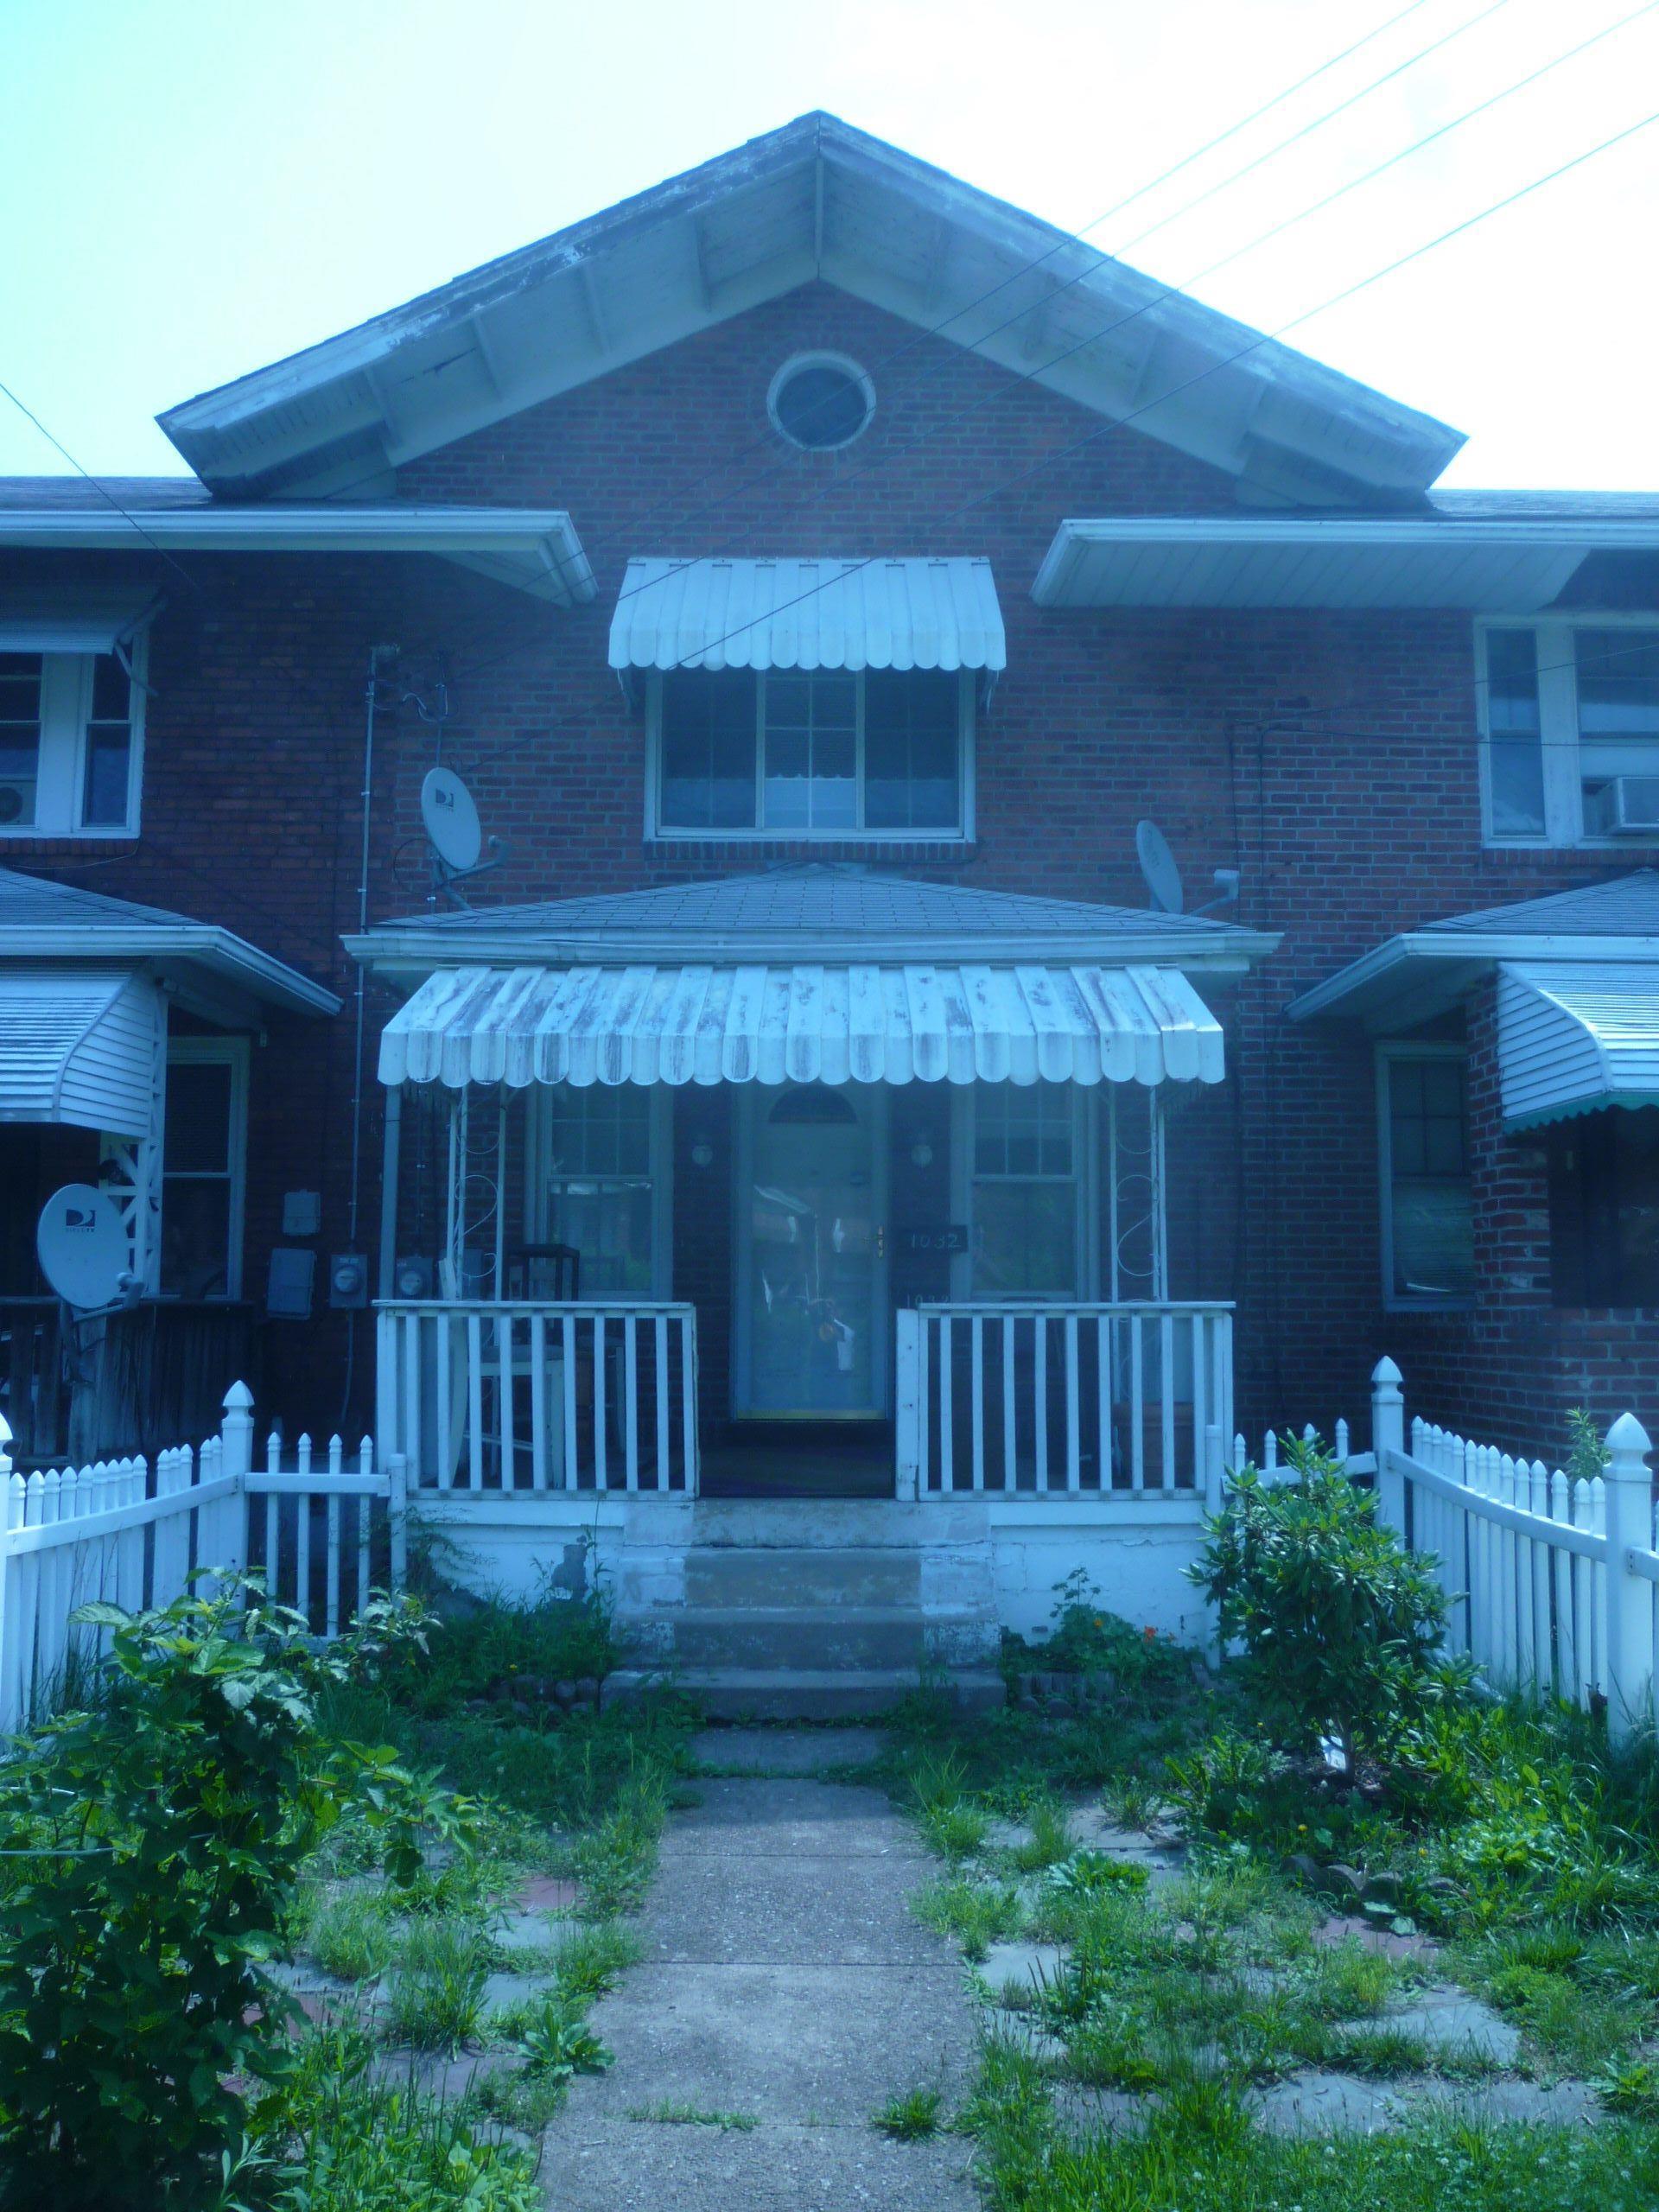 1032 Pennsylvania Ave (Image - 1)